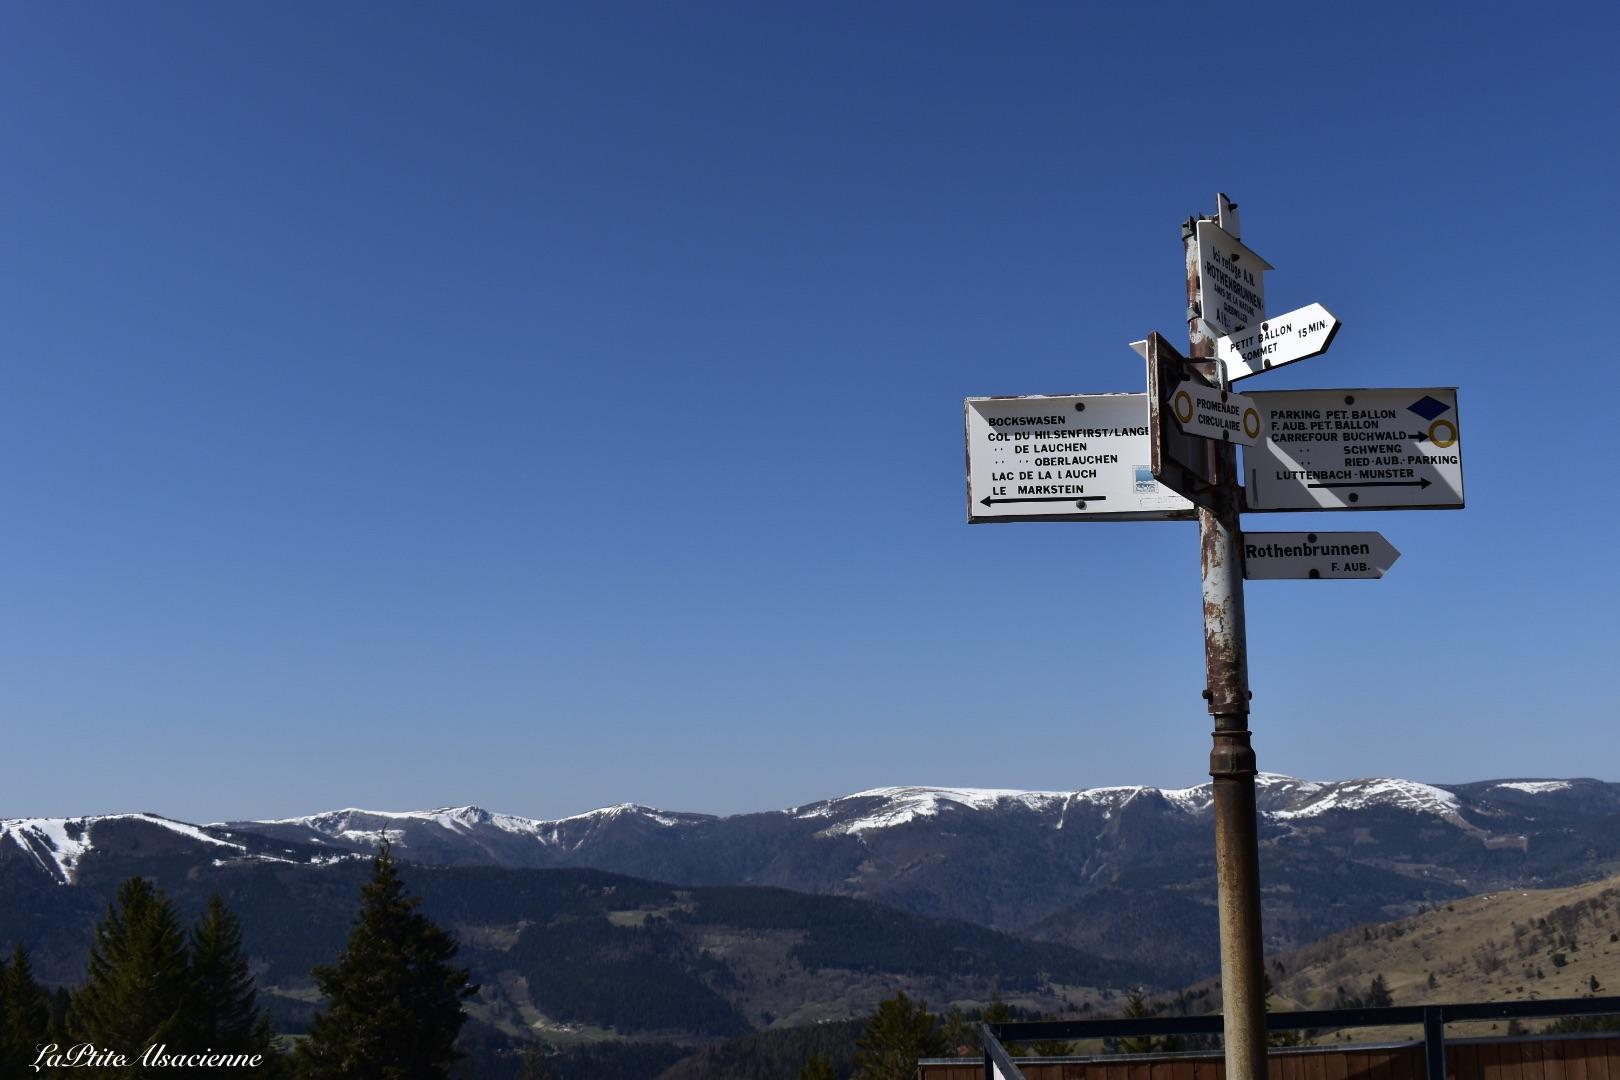 Panneau directionnel depuis refuge rothenbrunnen